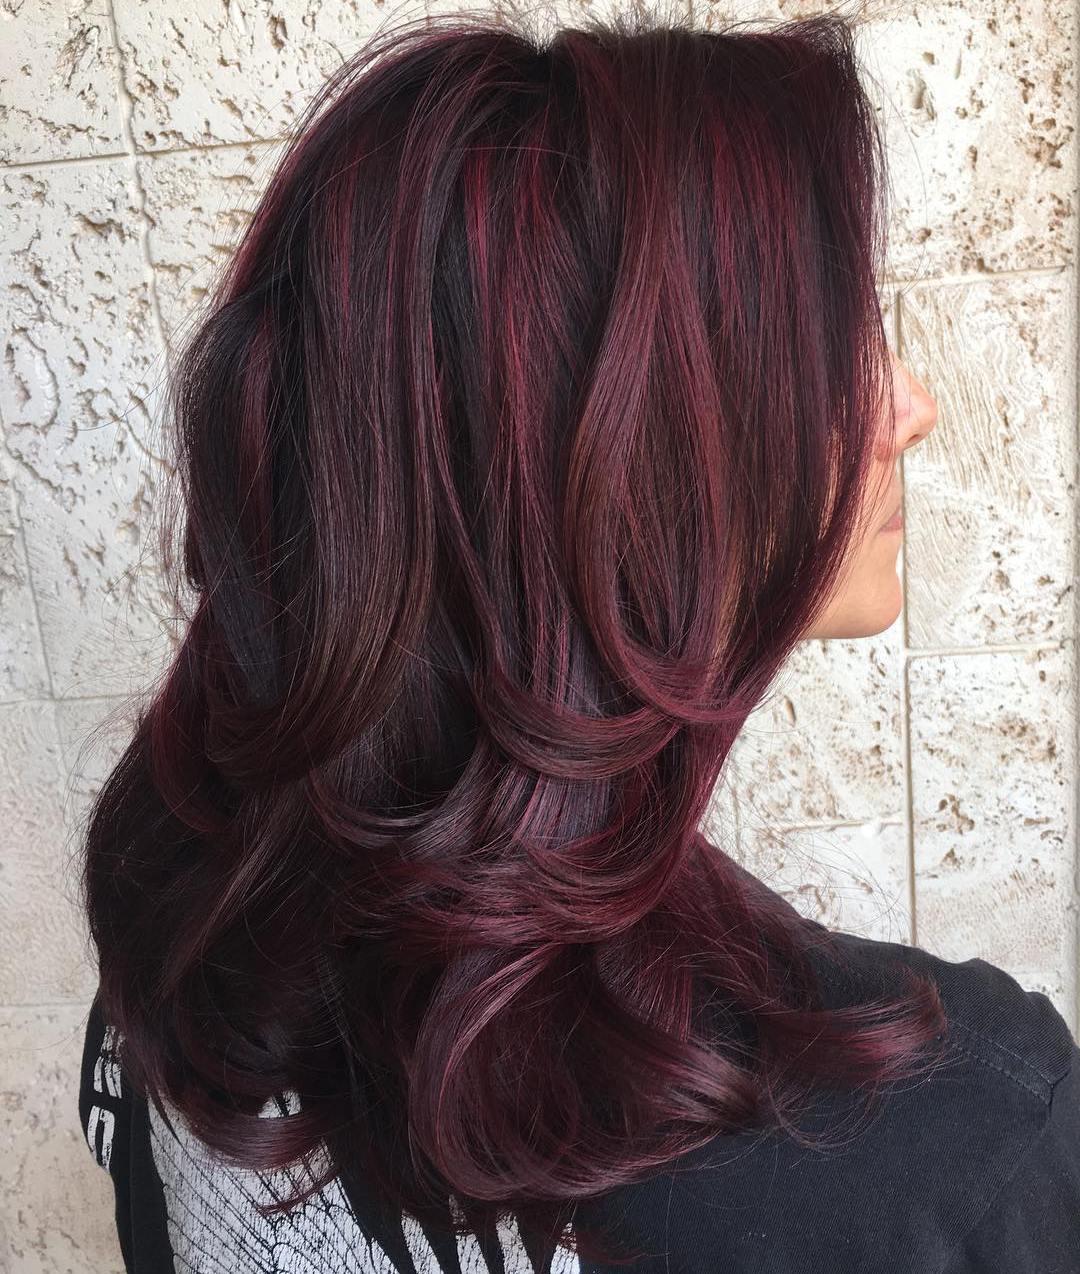 Remarkable 50 Shades Of Burgundy Hair Dark Burgundy Maroon Burgundy With Hairstyle Inspiration Daily Dogsangcom